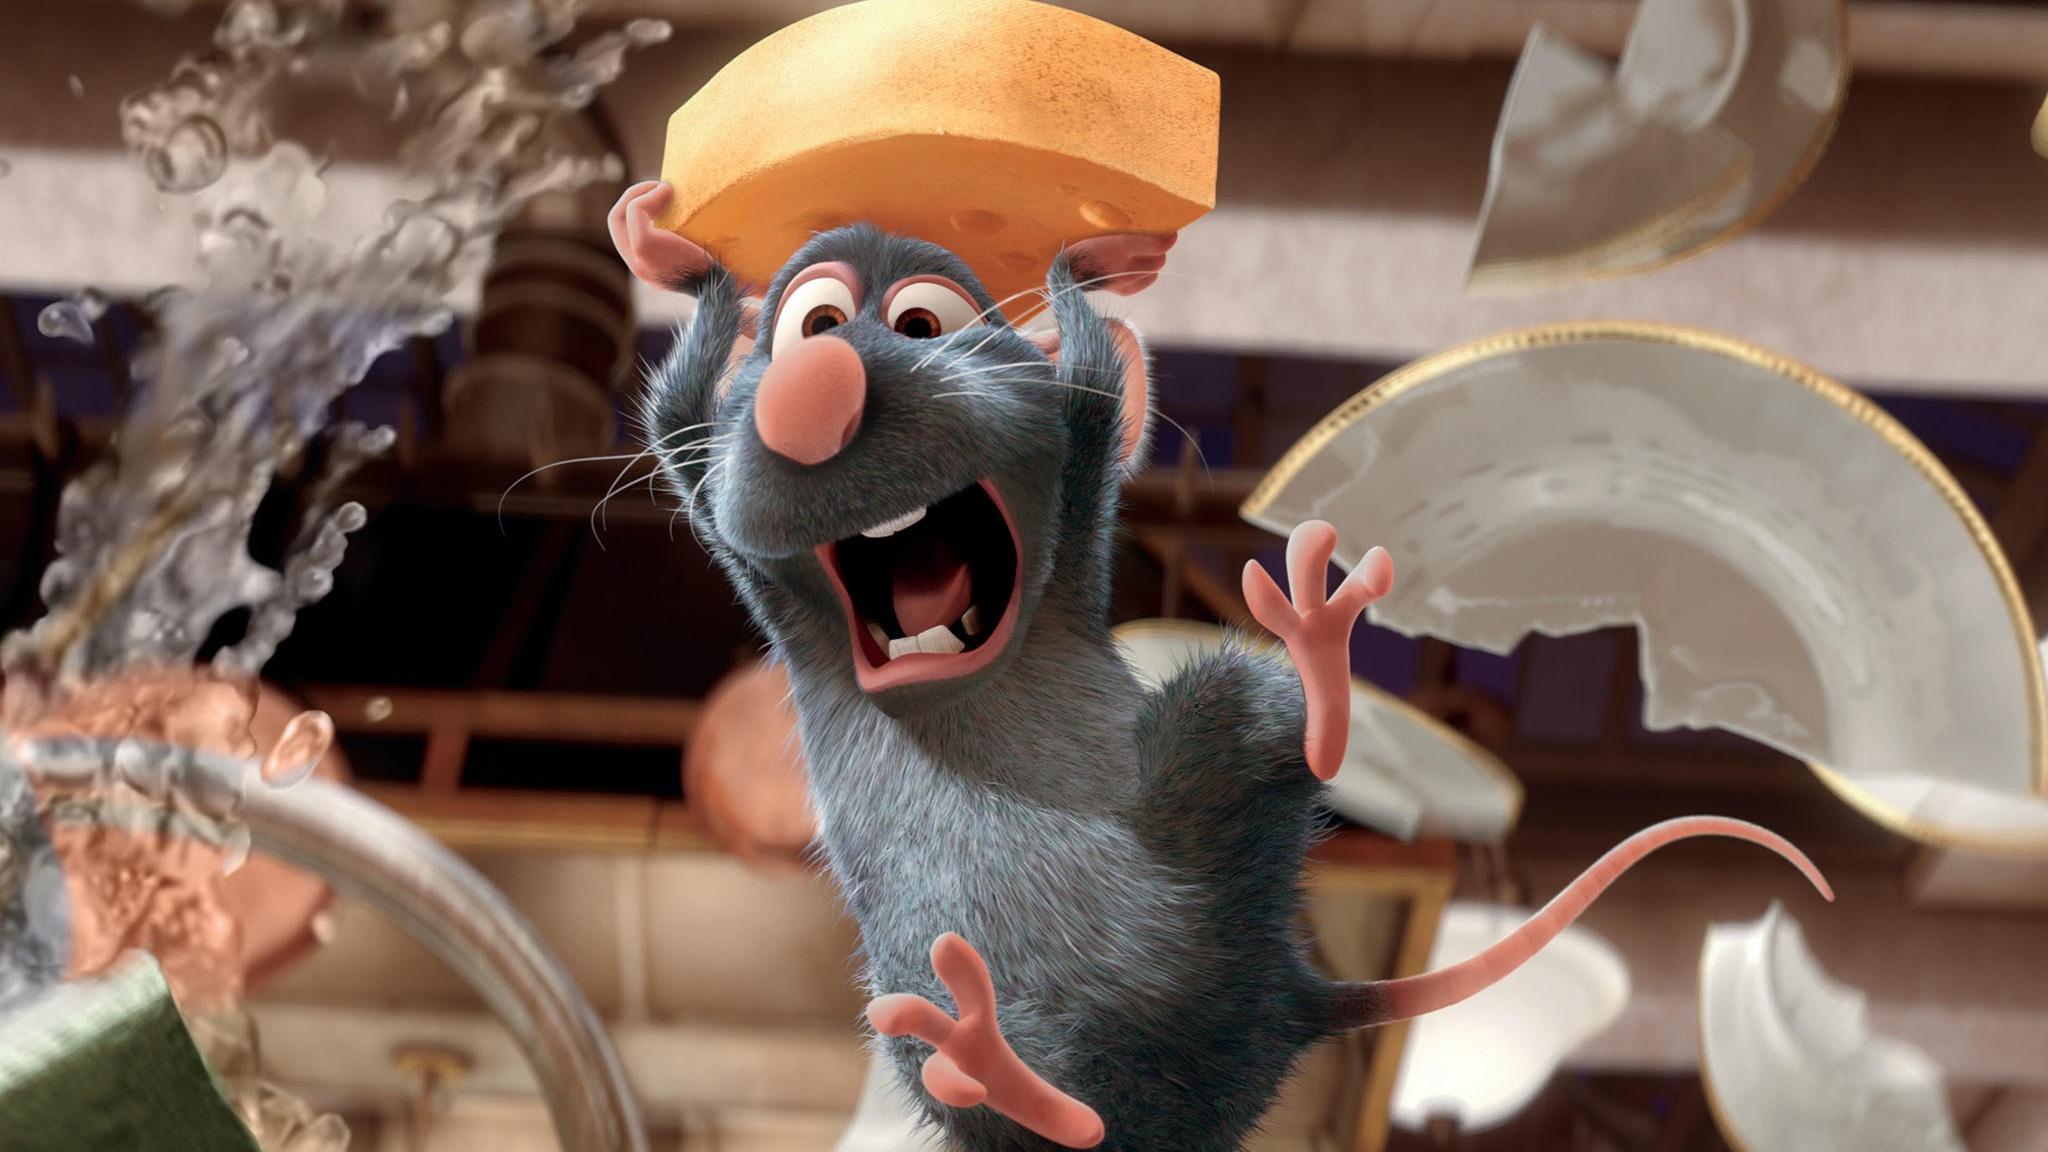 #5) Ratatouille - (2007 - dir. Brad Bird)